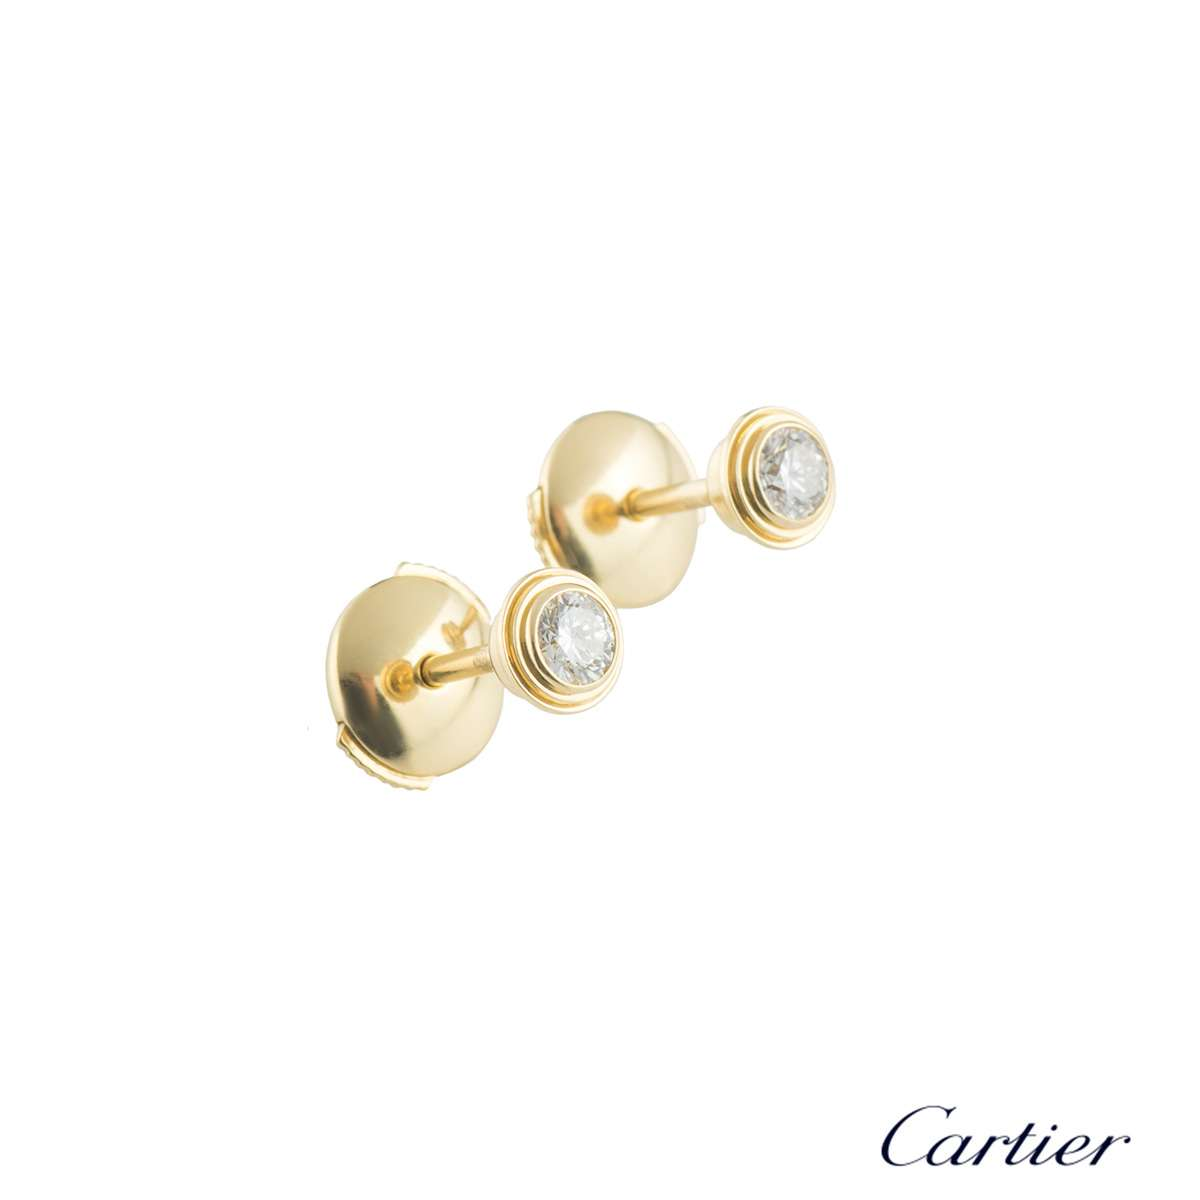 Cartier Yellow Gold Legers Diamond Earrings B8041600